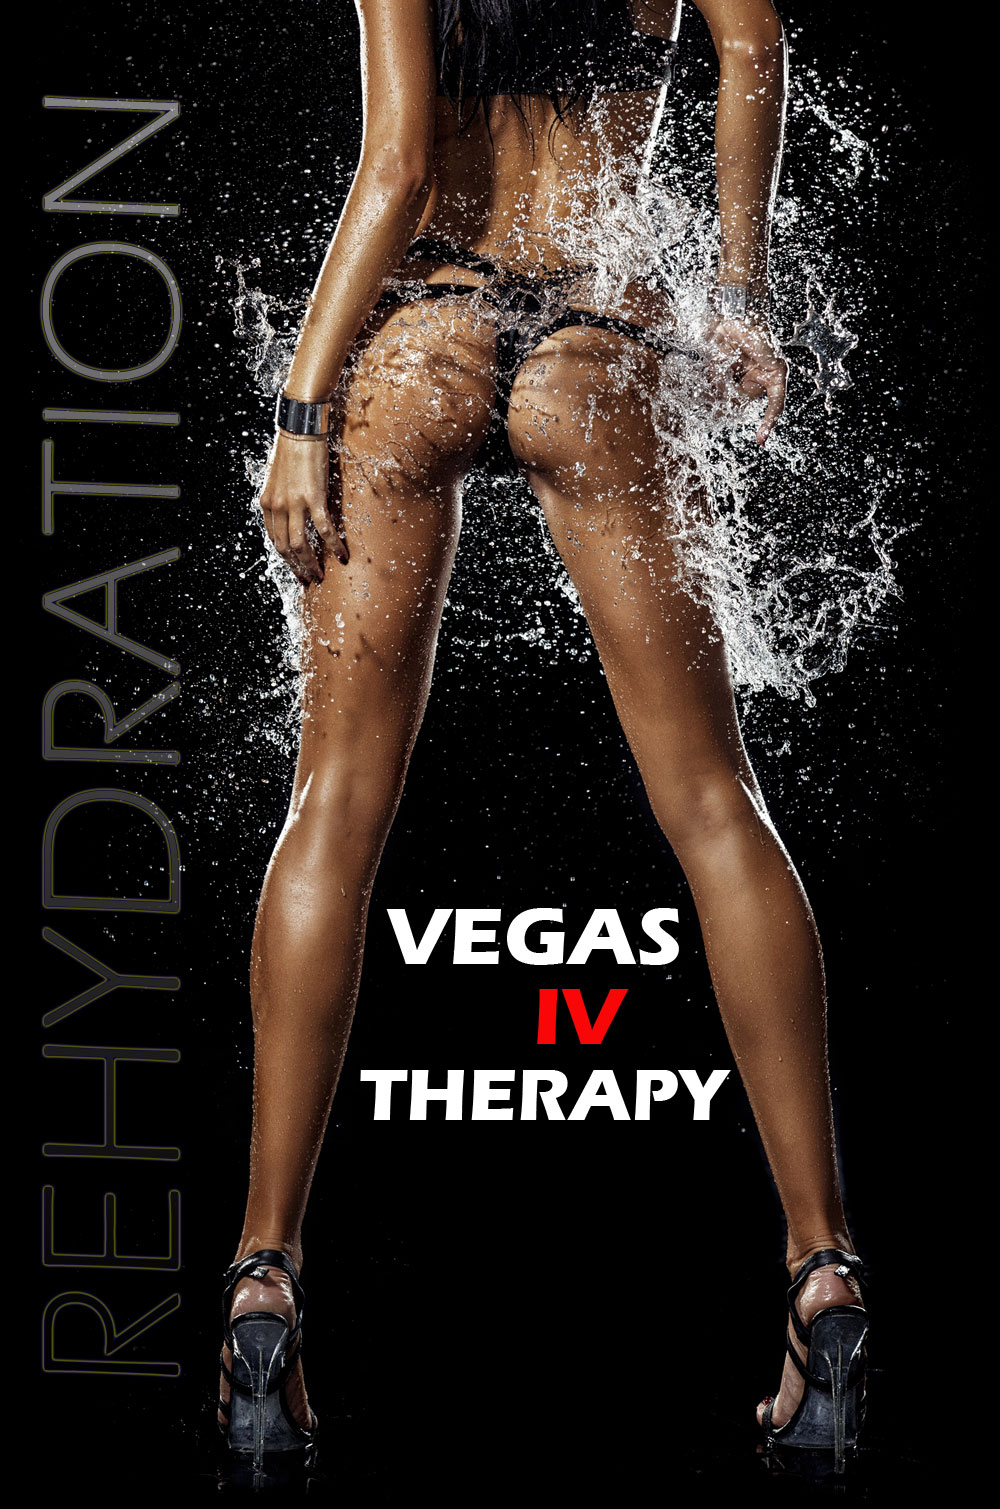 Limo Service Las Vegas Sheets Vip